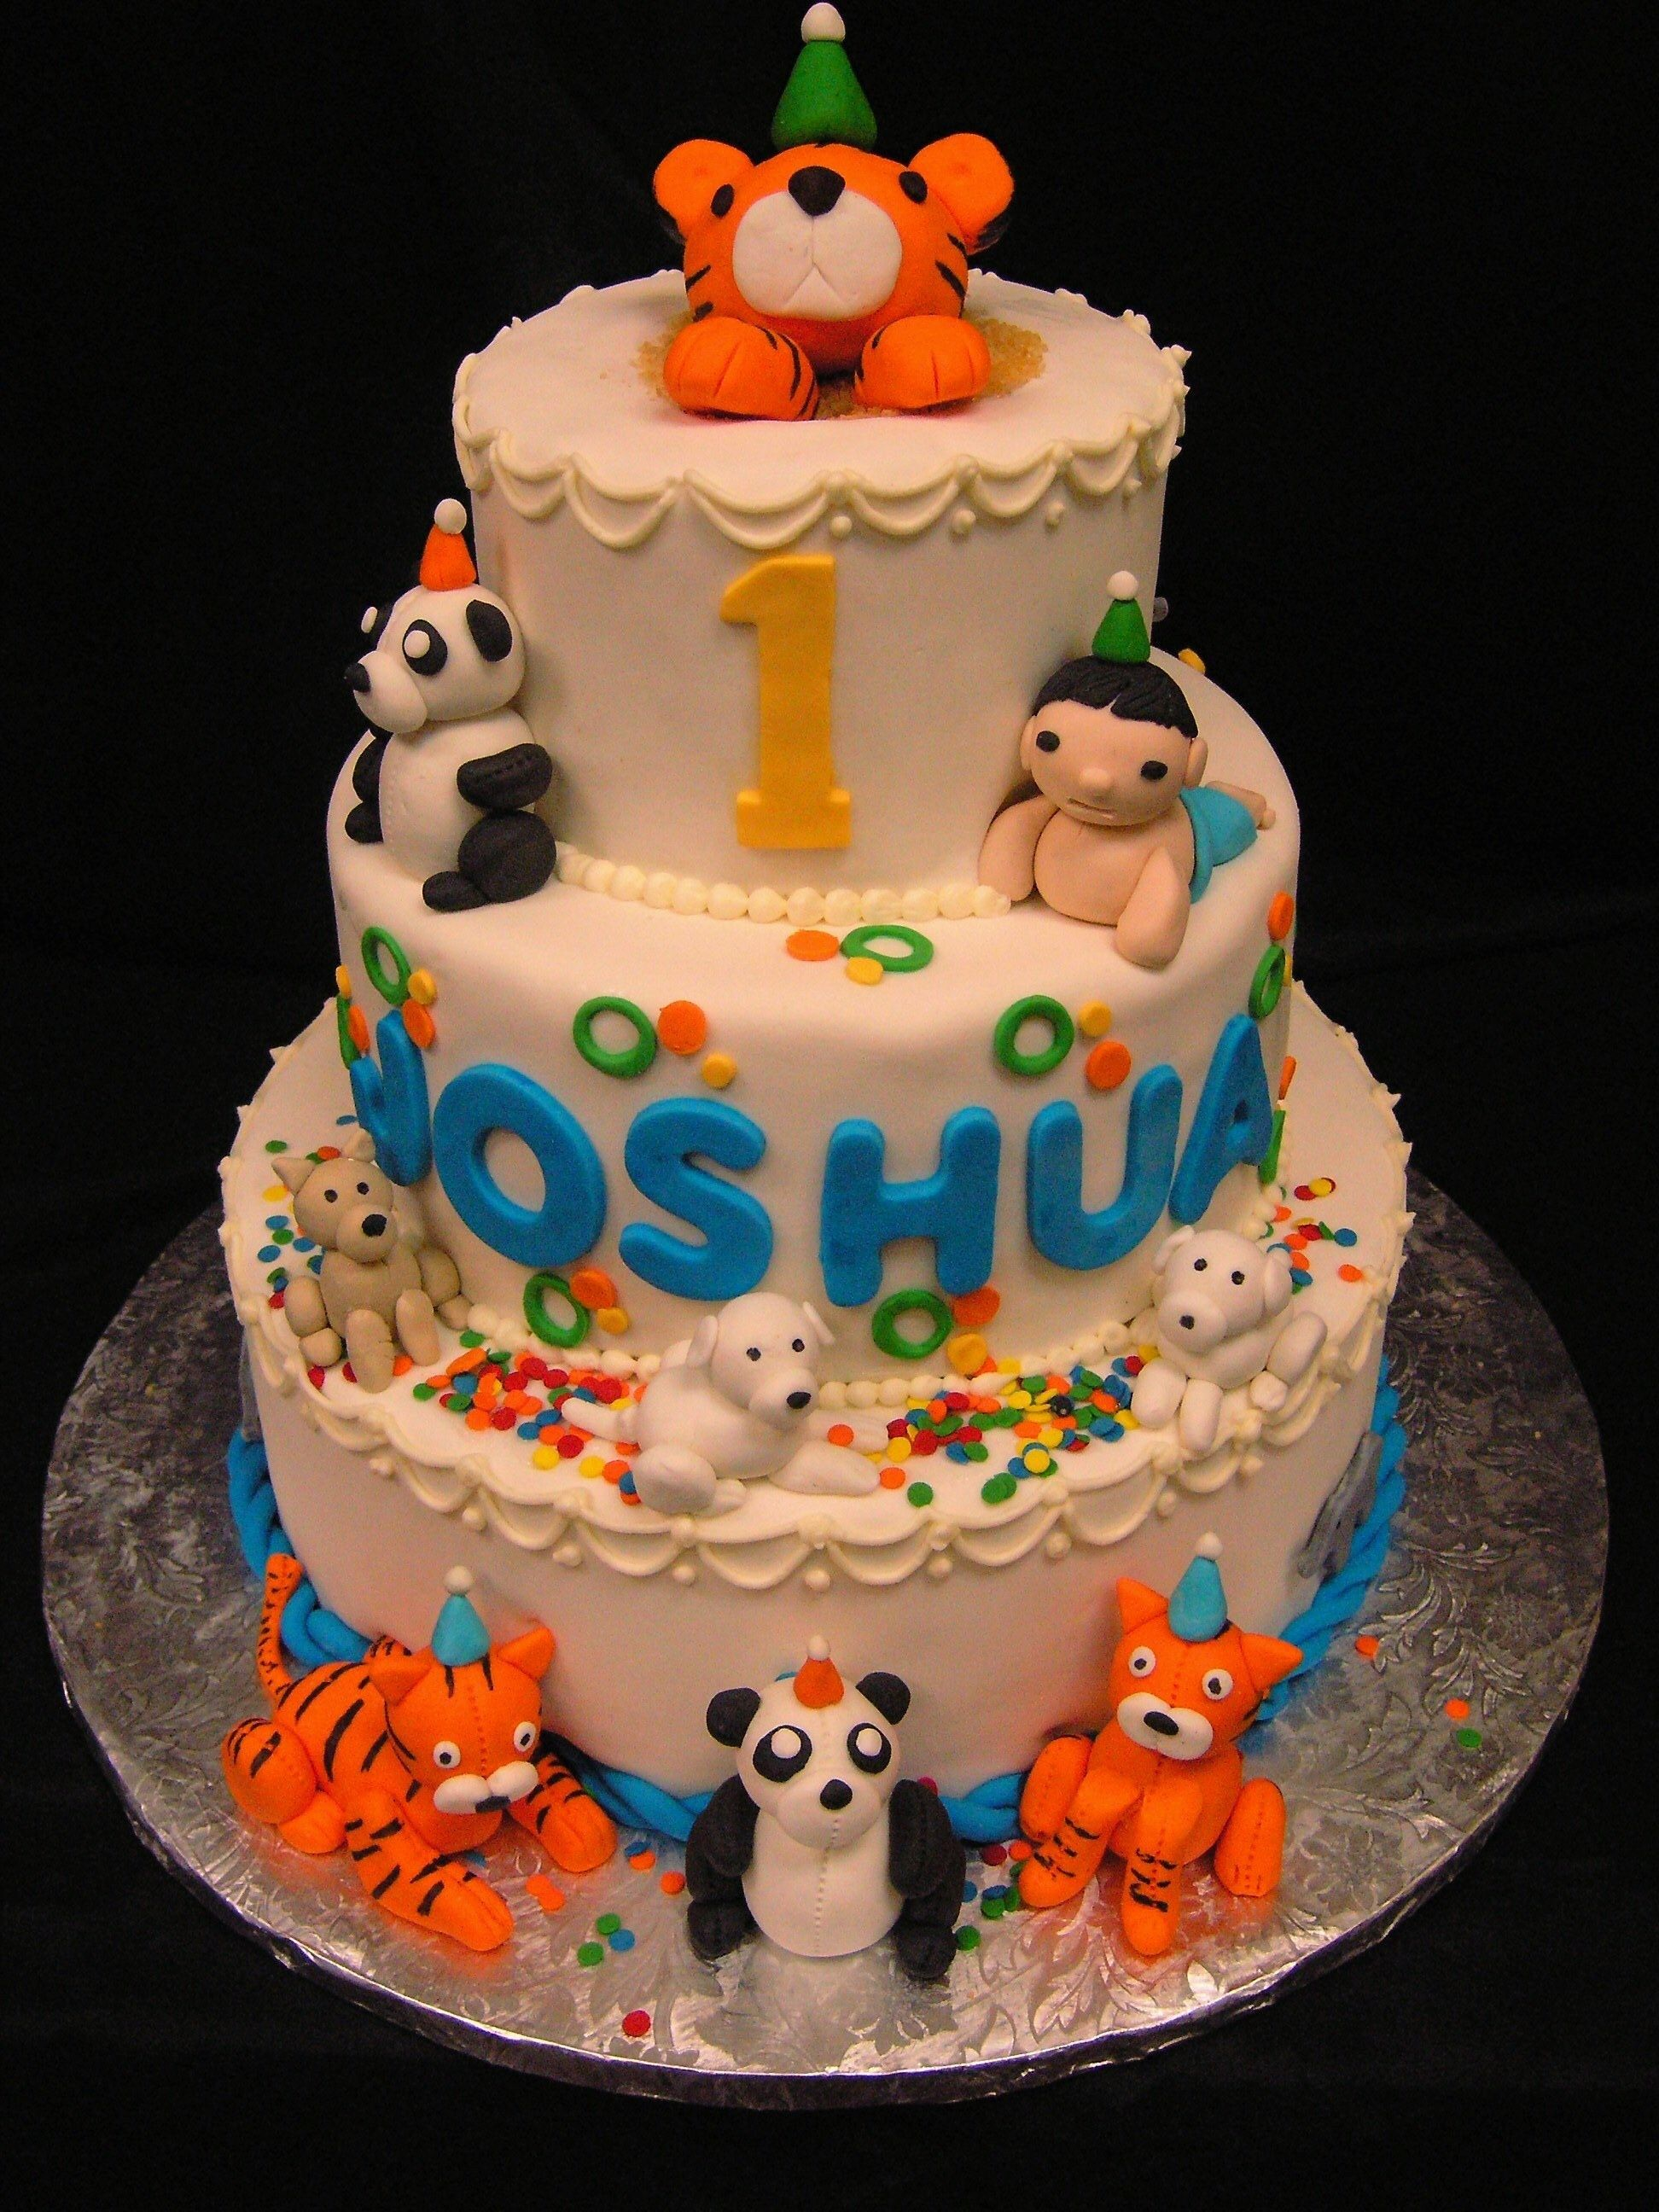 21 Great Photo Of 3d Birthday Cakes Birijus Com 3d Birthday Cake Diy Birthday Cake Cake